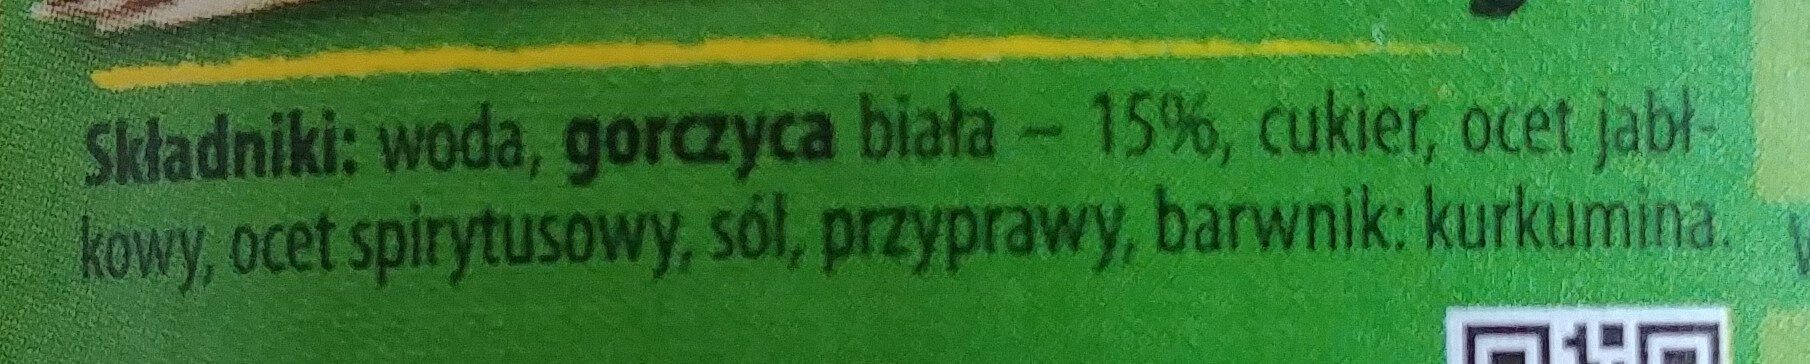 Musztarda delikatesowa - Składniki - pl